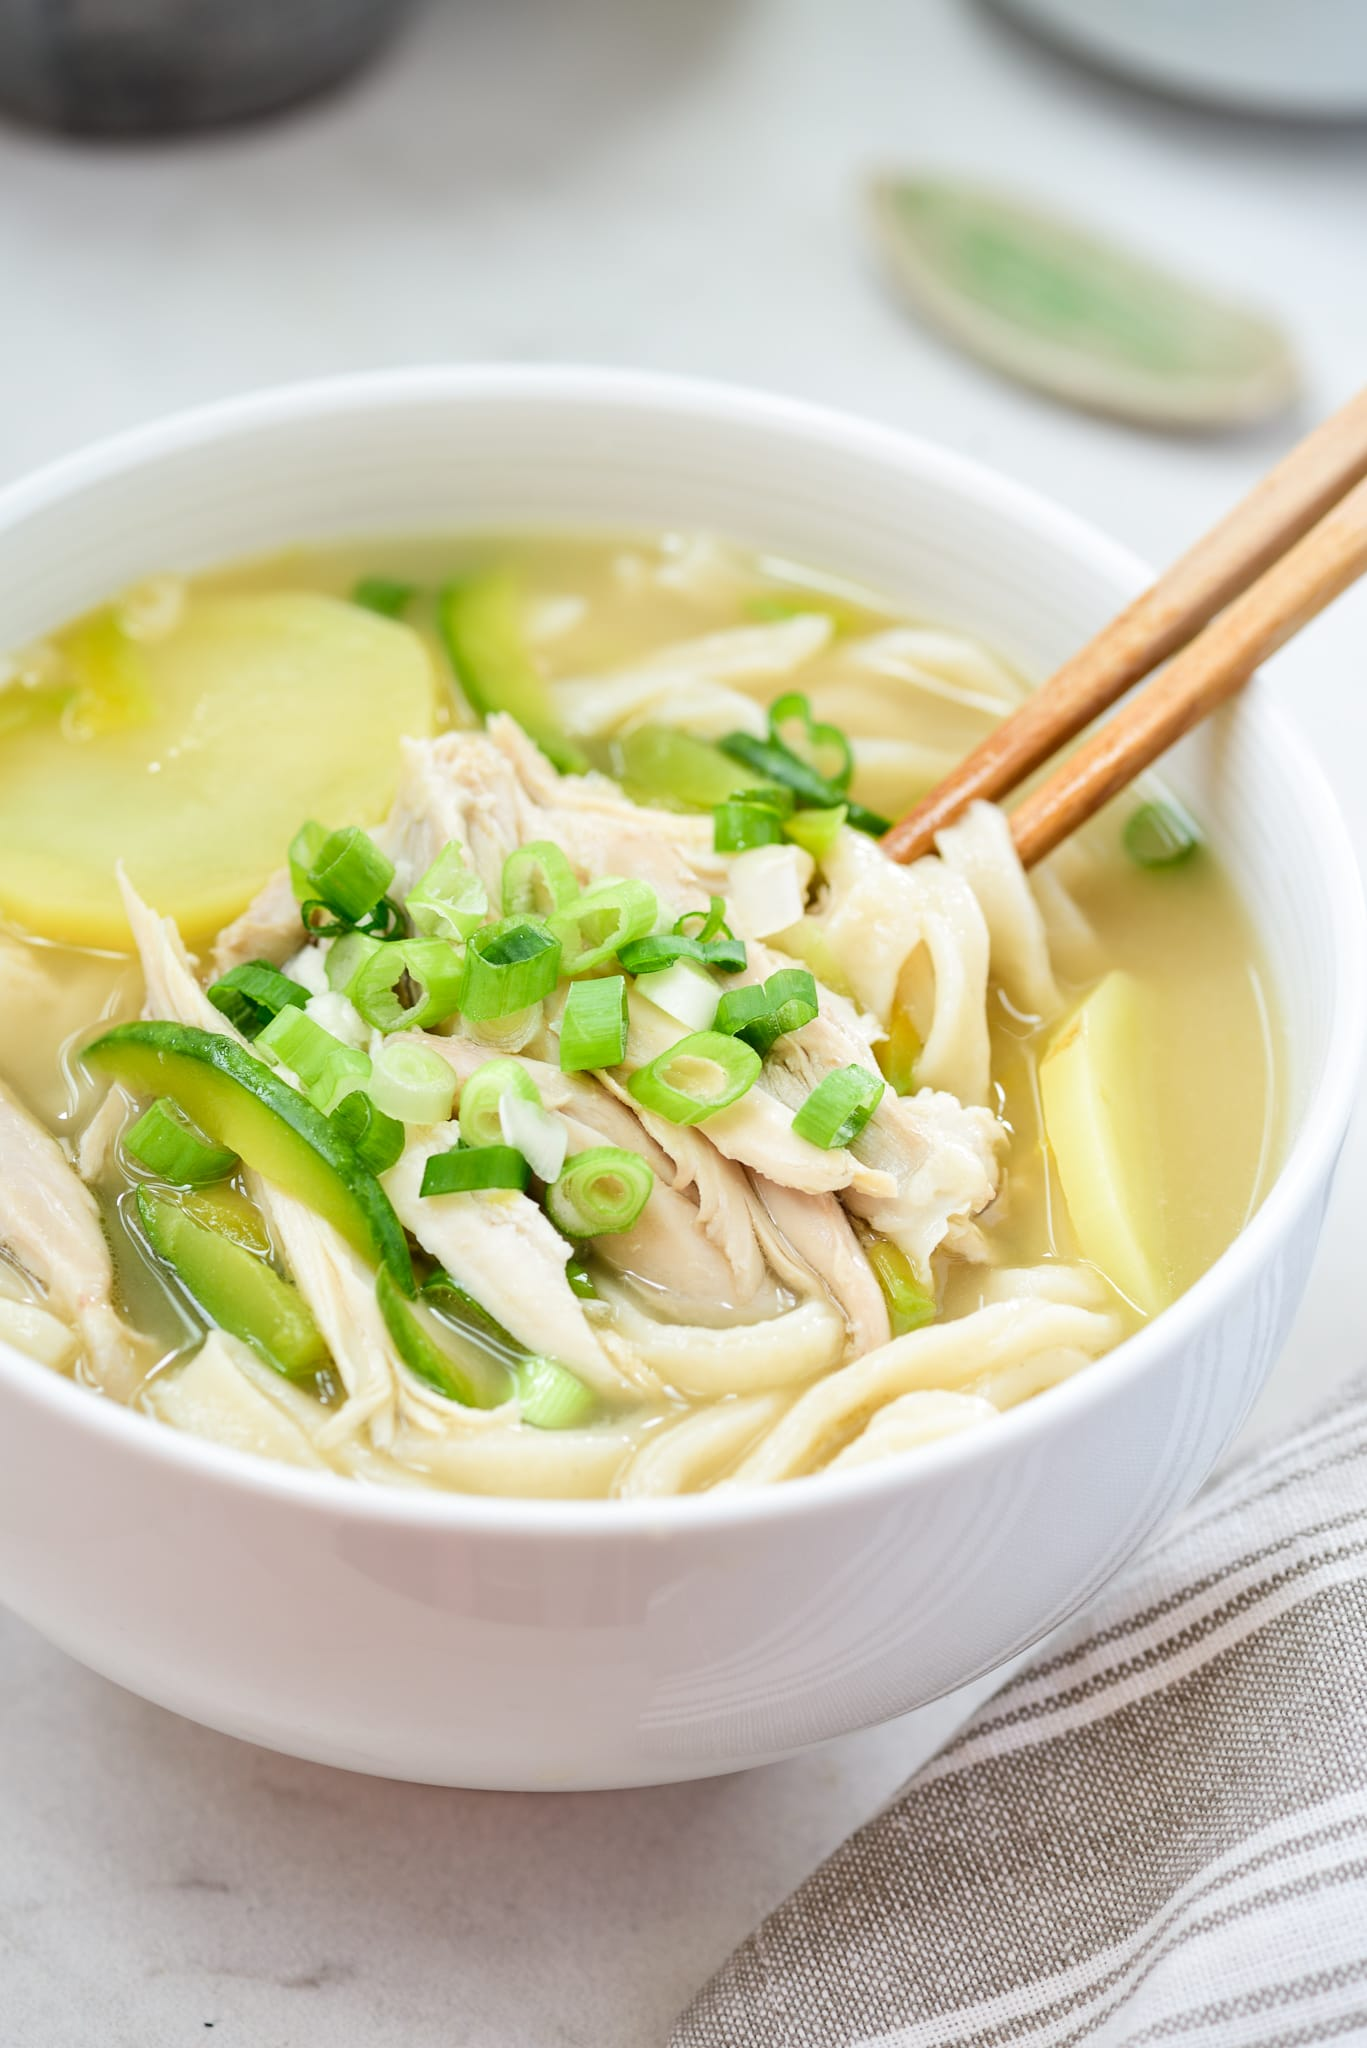 DSC2876 - Dak Kalguksu (Chicken Noodle Soup)